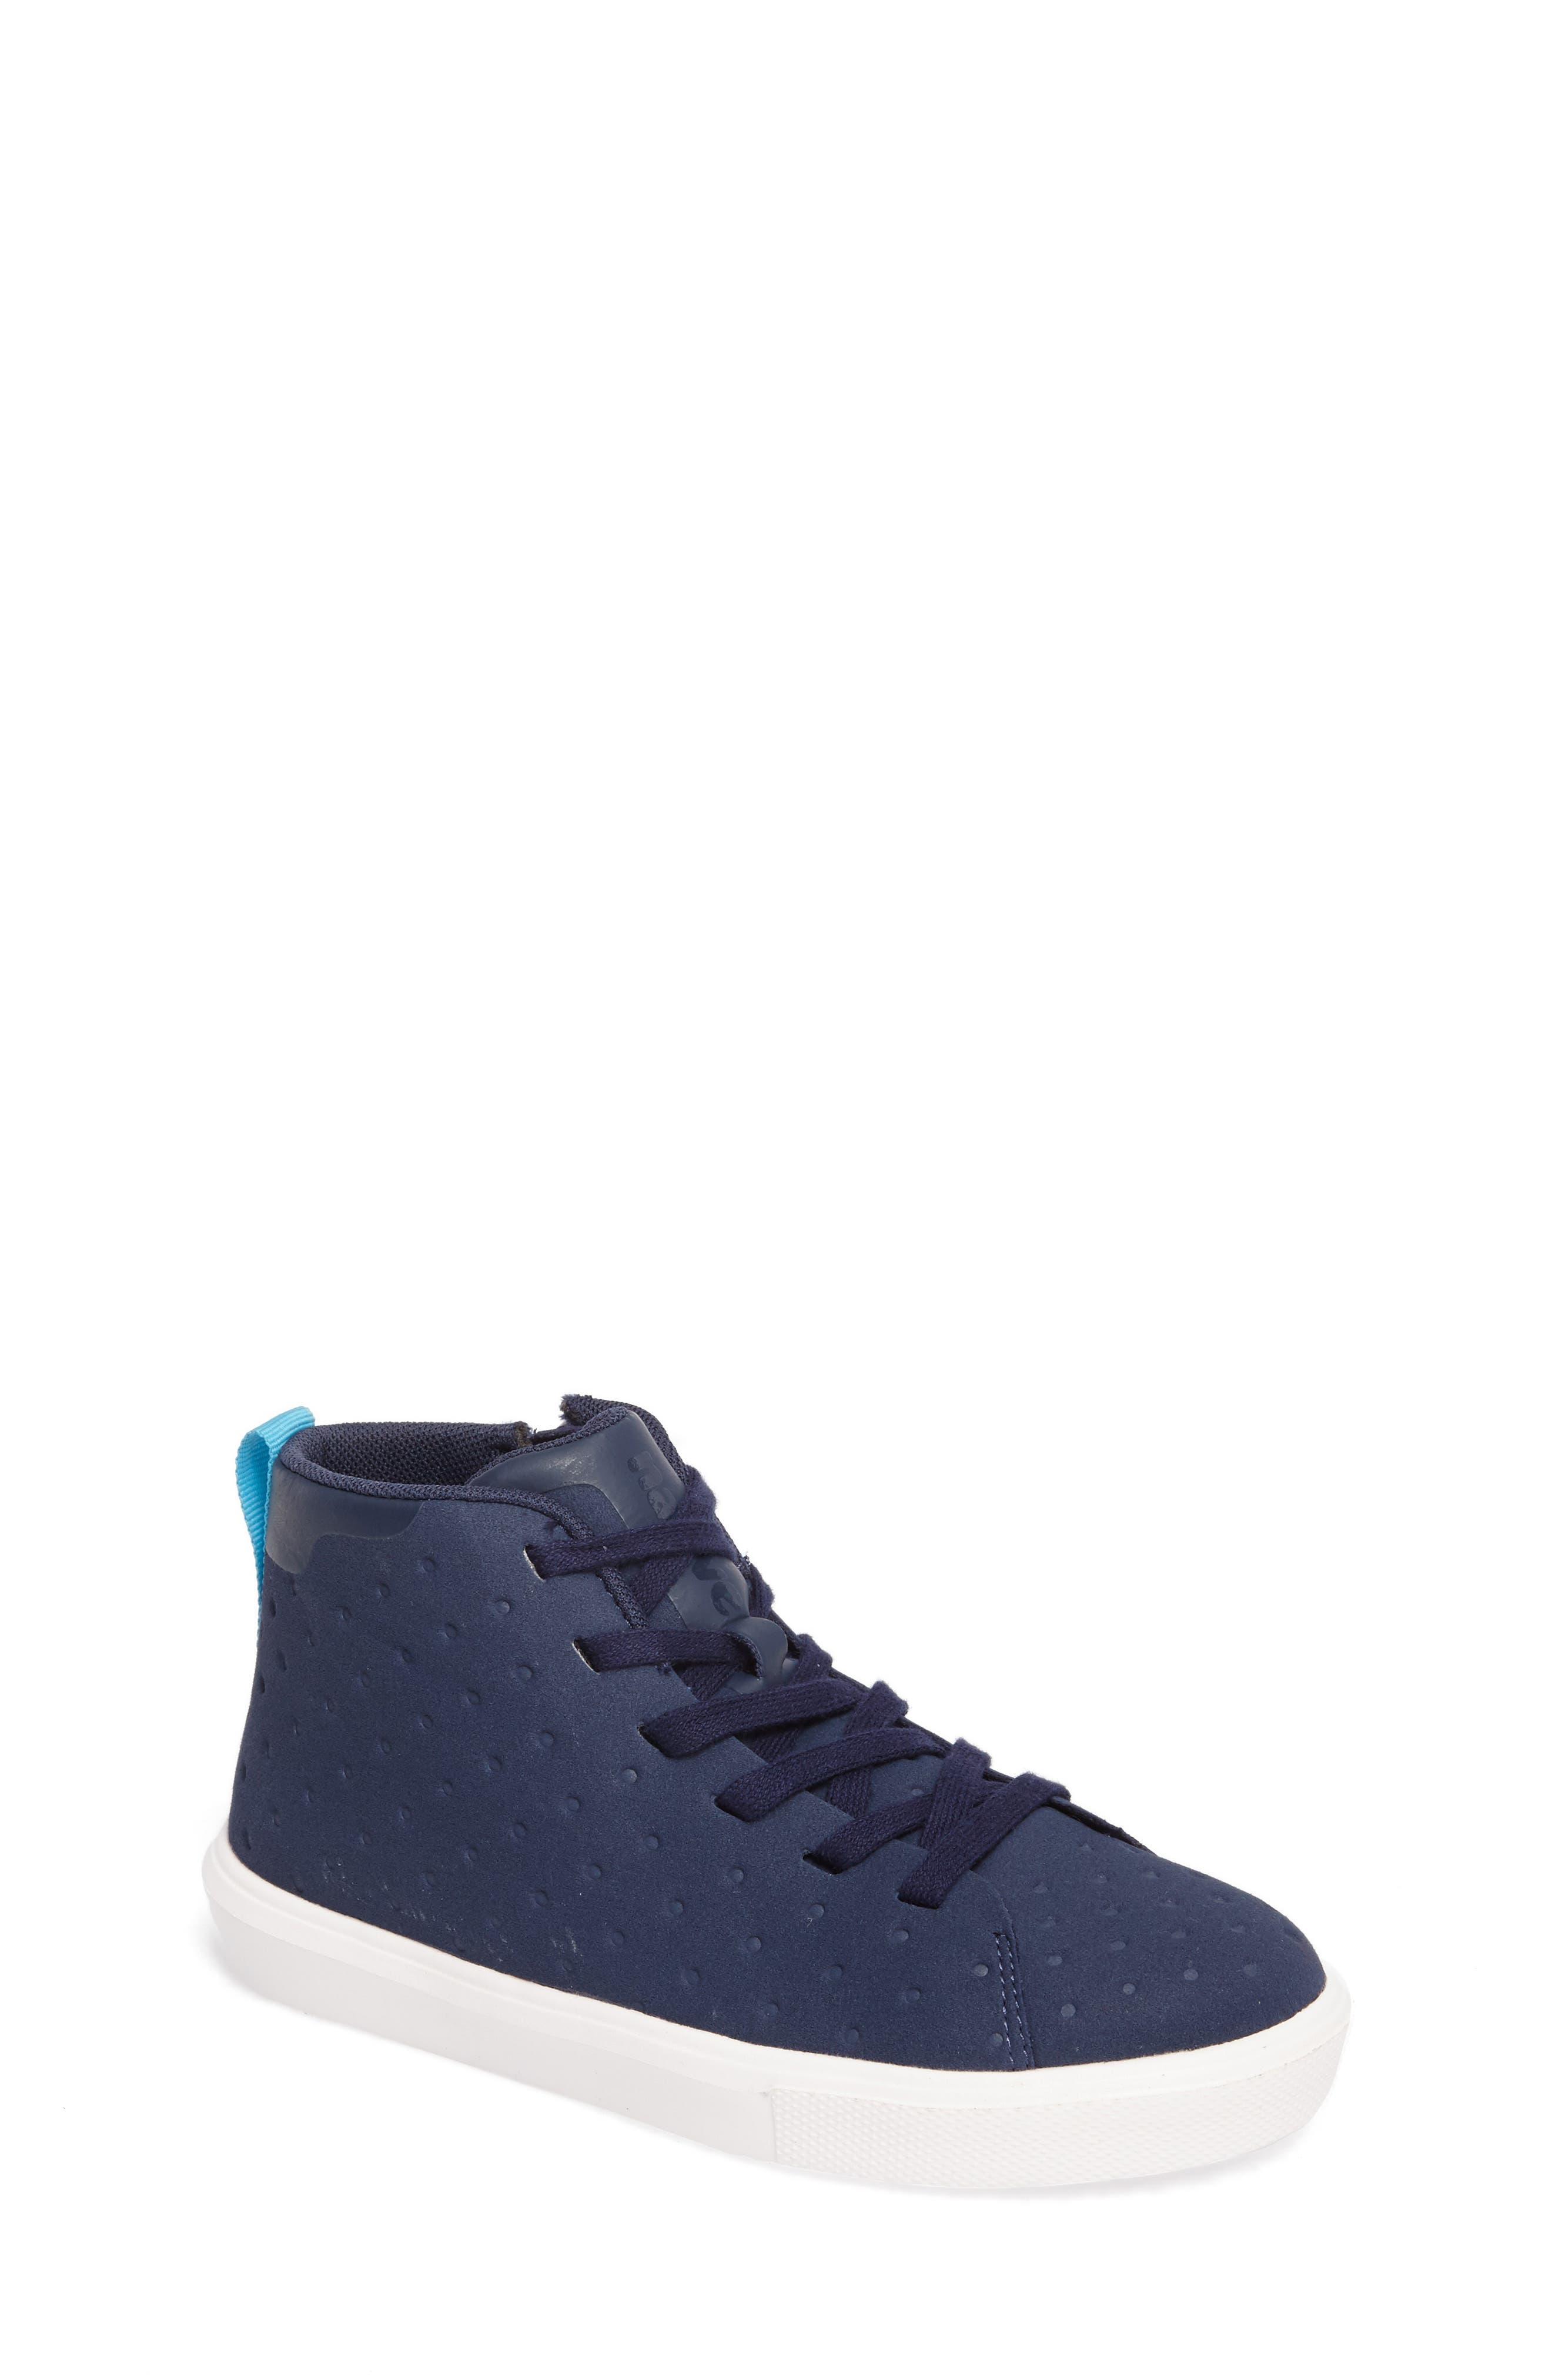 Native Monaco Sneaker,                             Main thumbnail 1, color,                             Regatta Blue/ Shell White